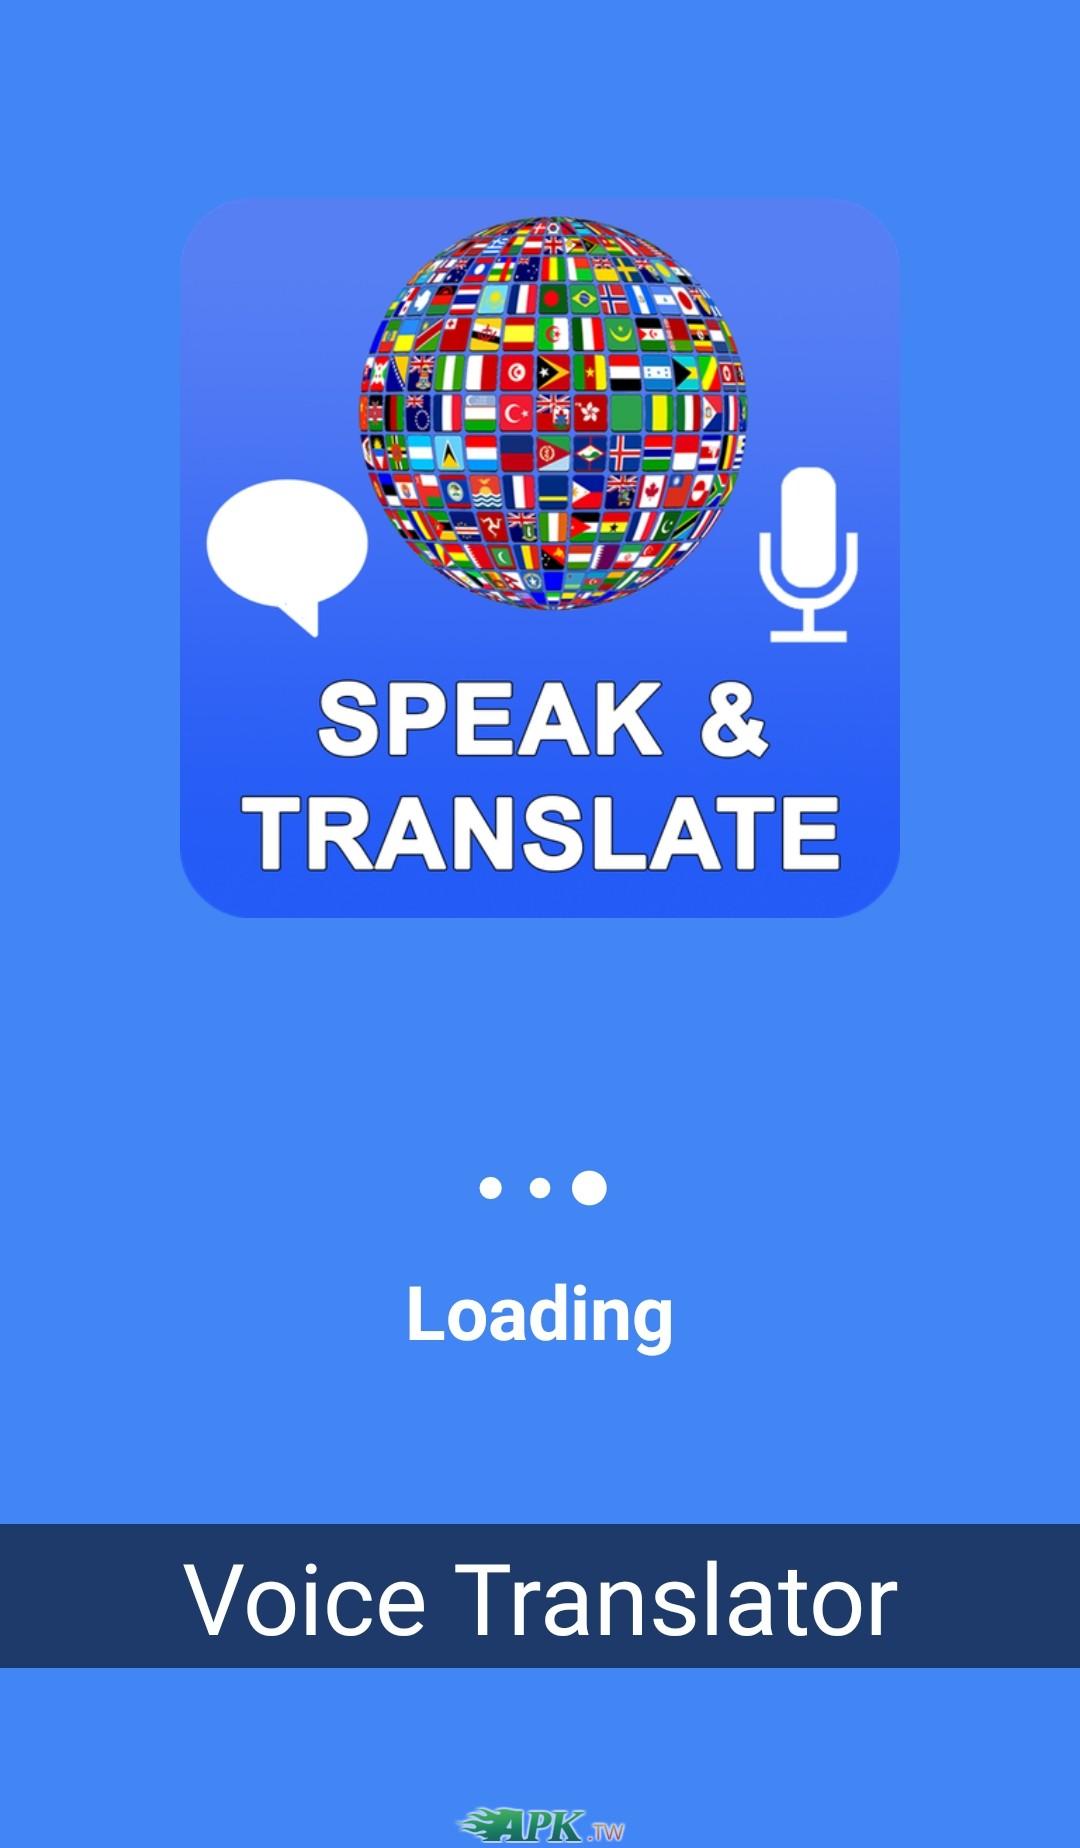 SpeakTranslate__1.jpg